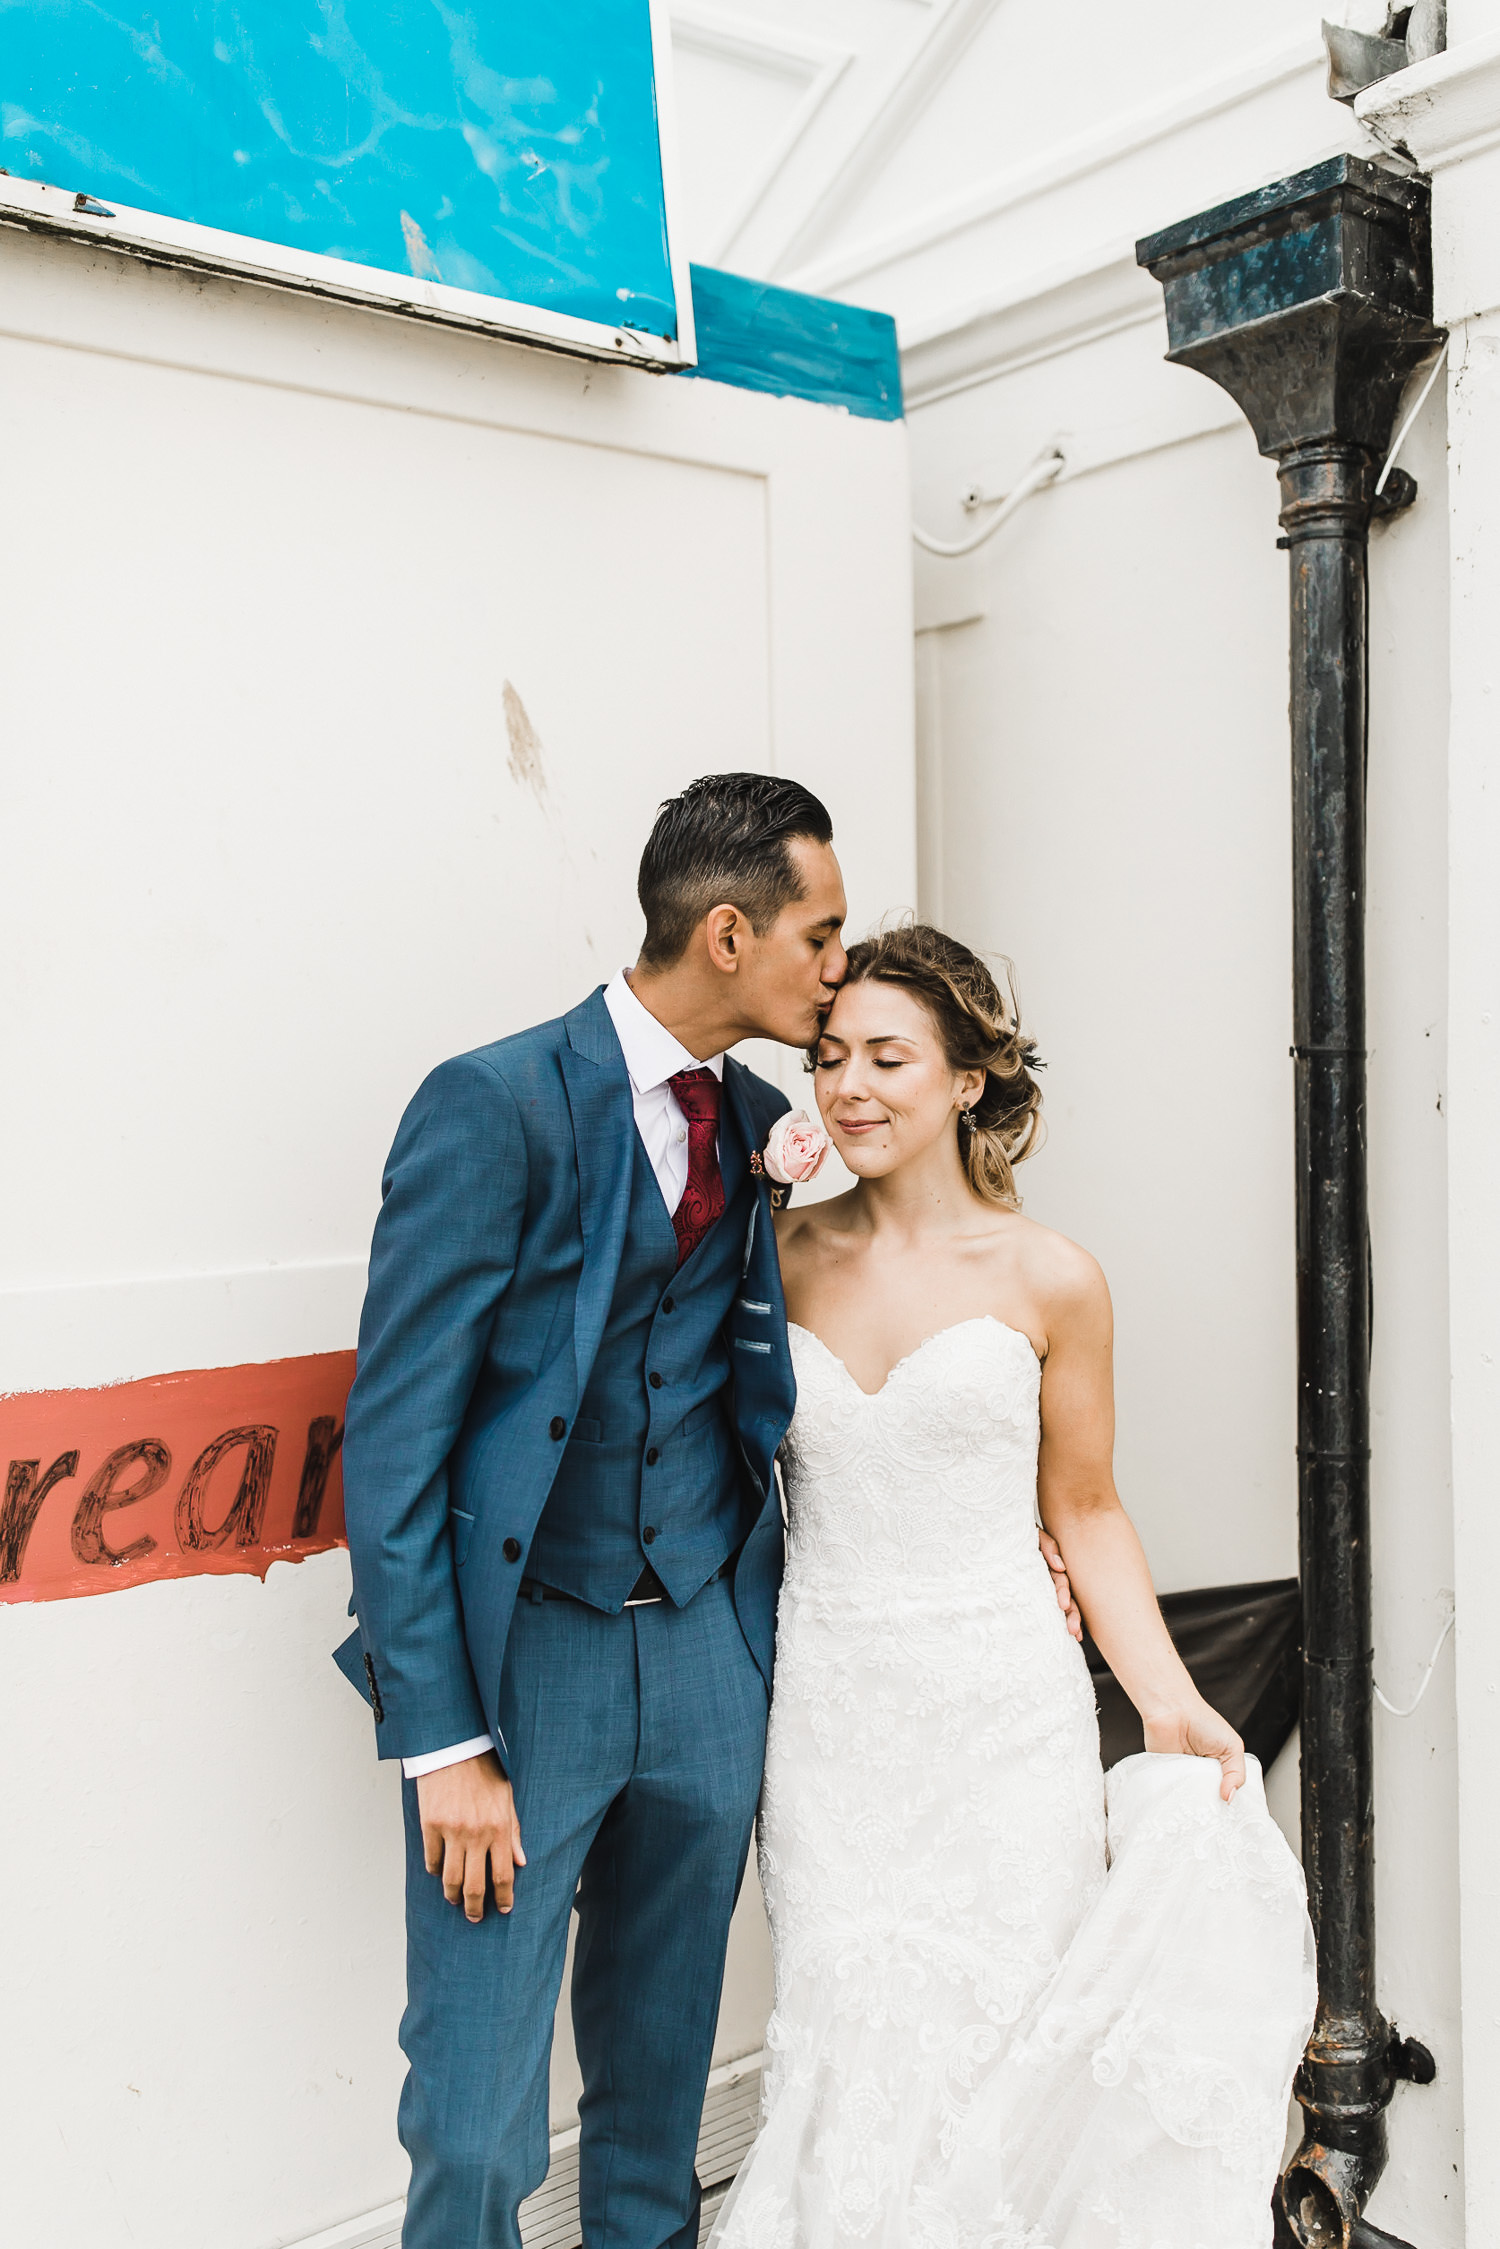 Margate_kent_seaside_fernery_greenhouse_wedding_0047.jpg